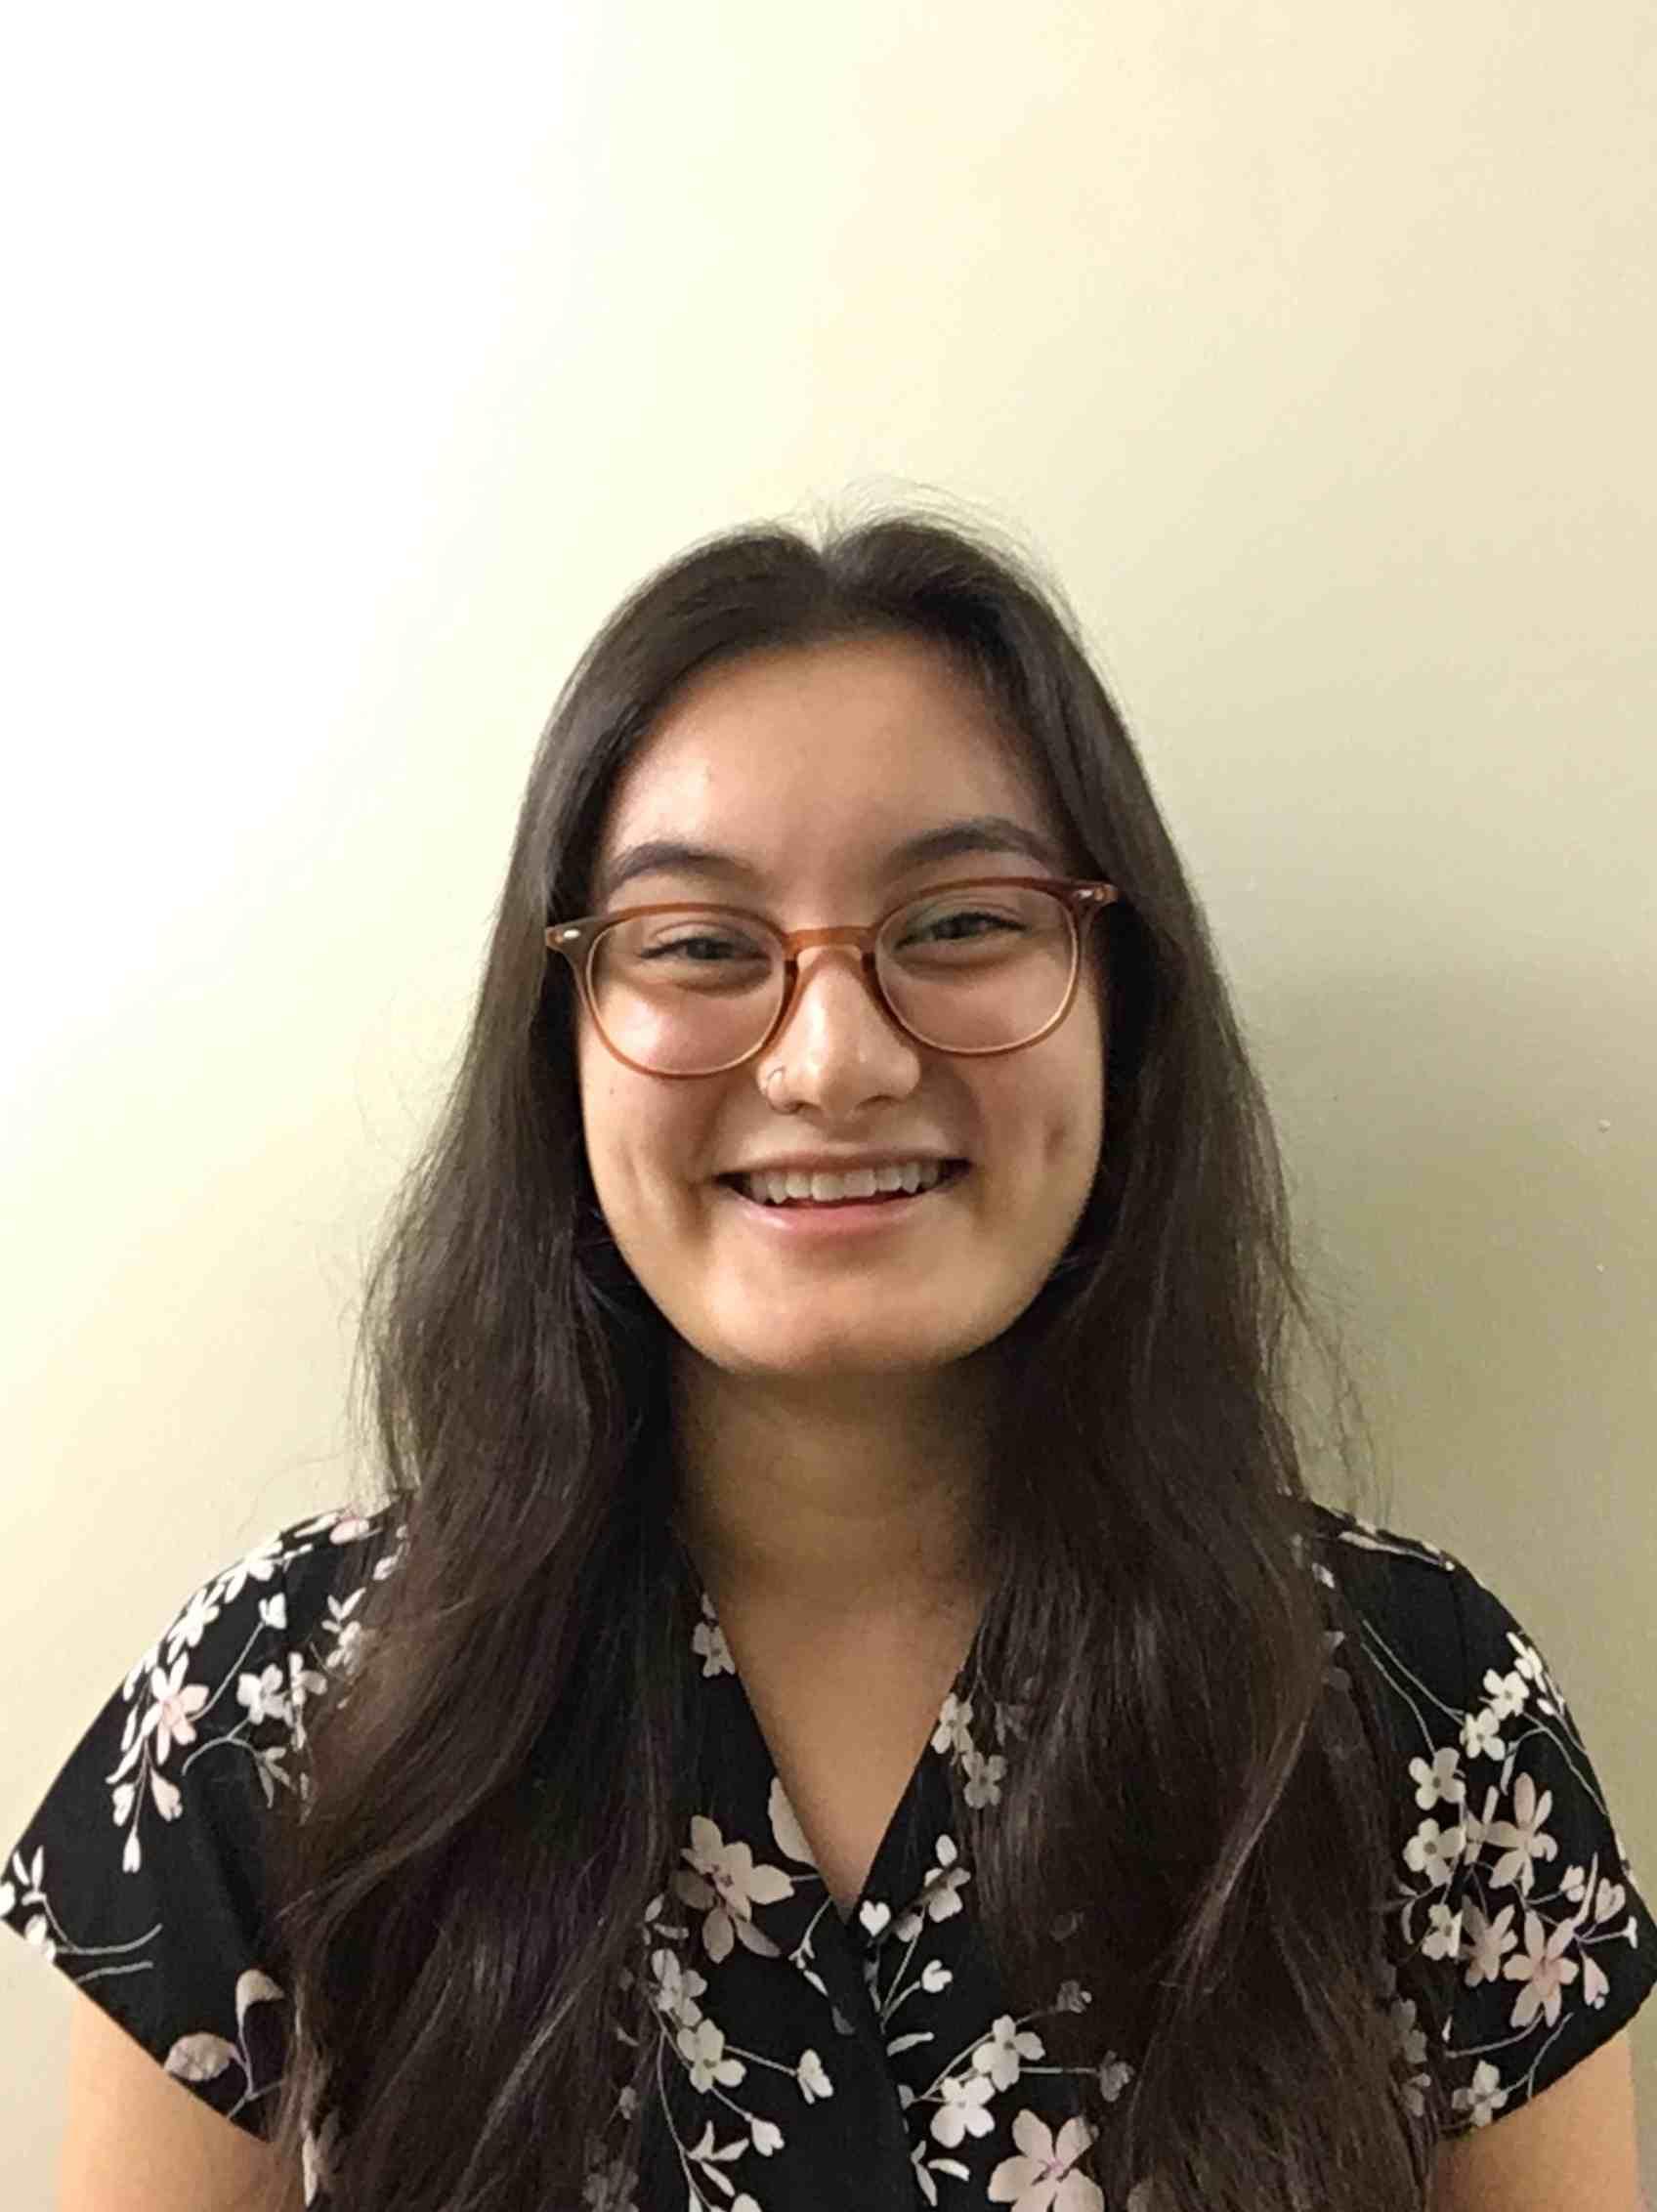 Sasha S. Yamada - 2019 Student Engineer of the Year